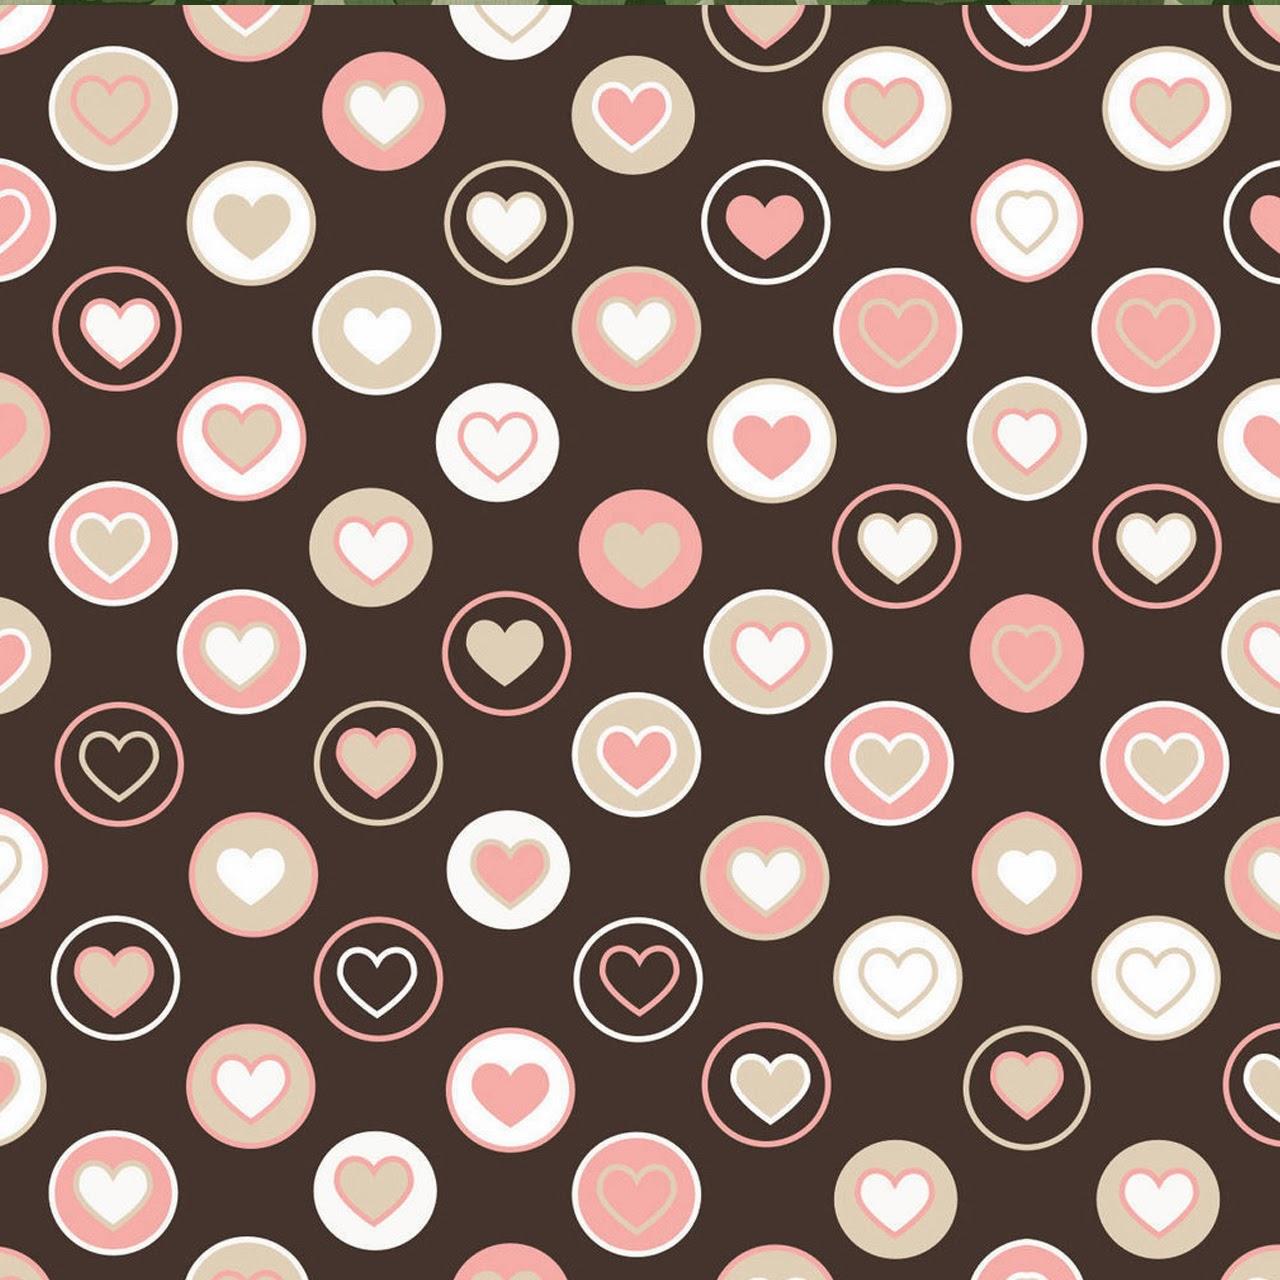 Hearts wallpapers part 5 for Imagenes bonitas para fondo de pantalla